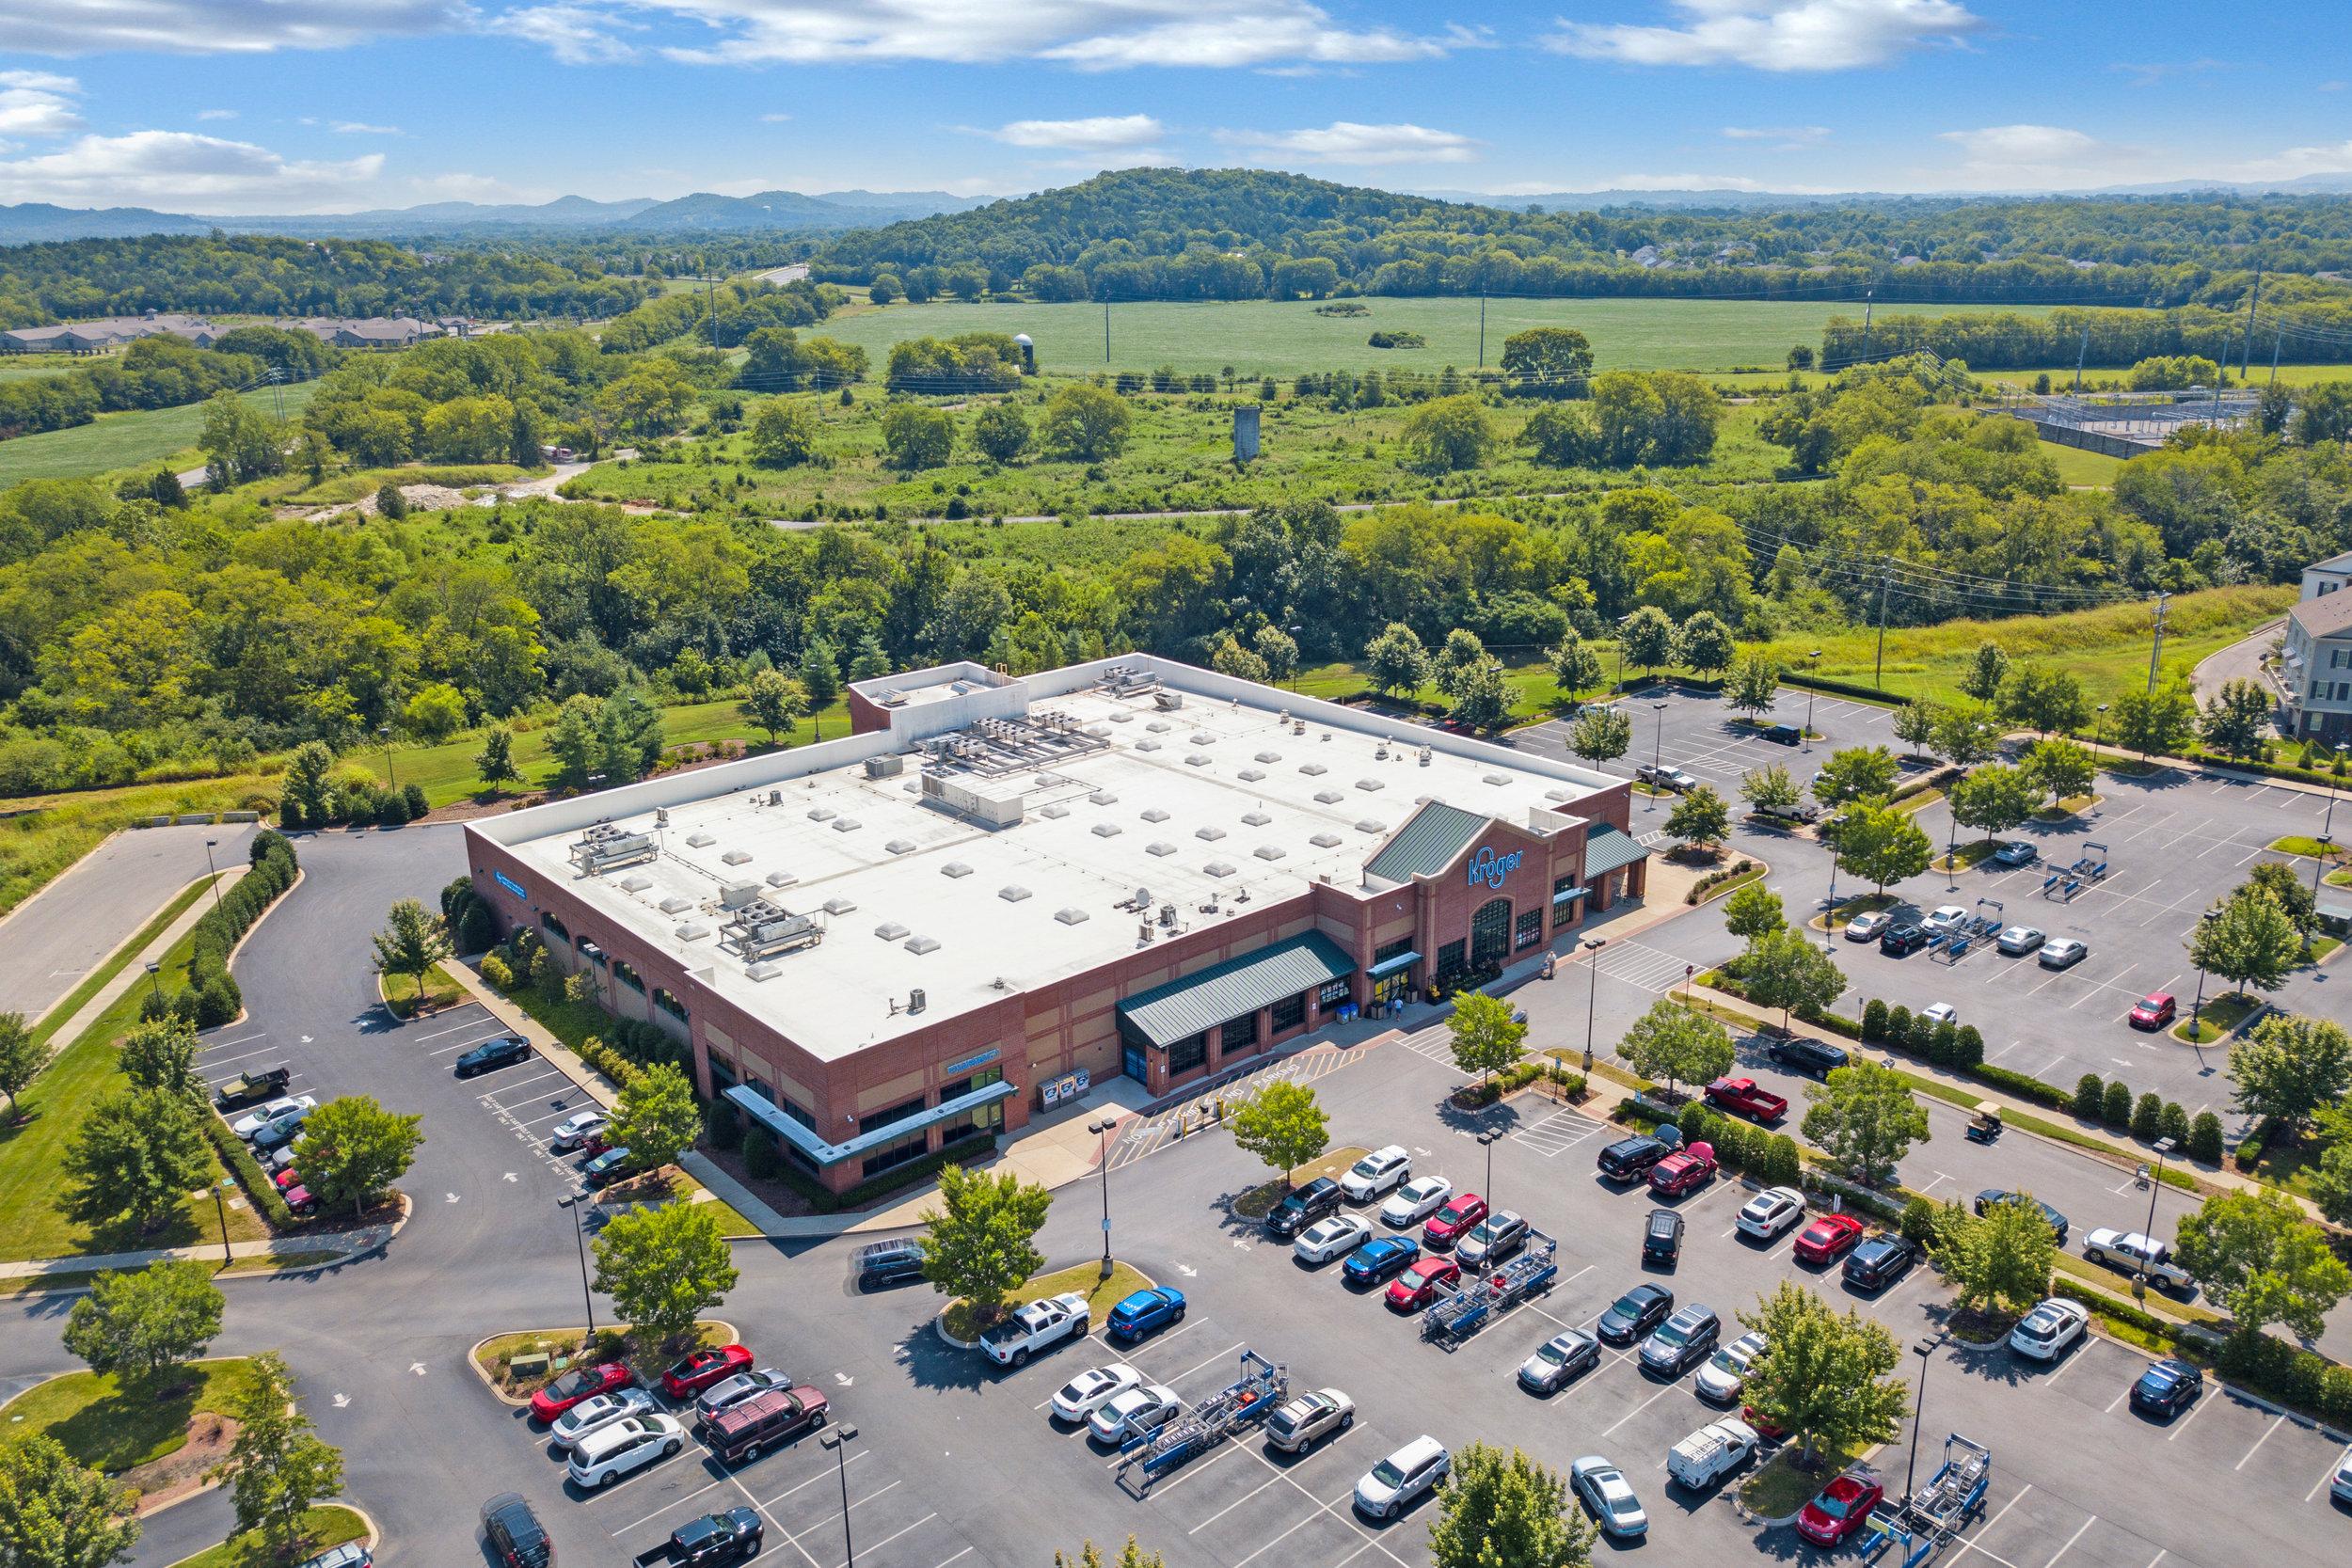 Single-tenant • Malls • Strip Centers